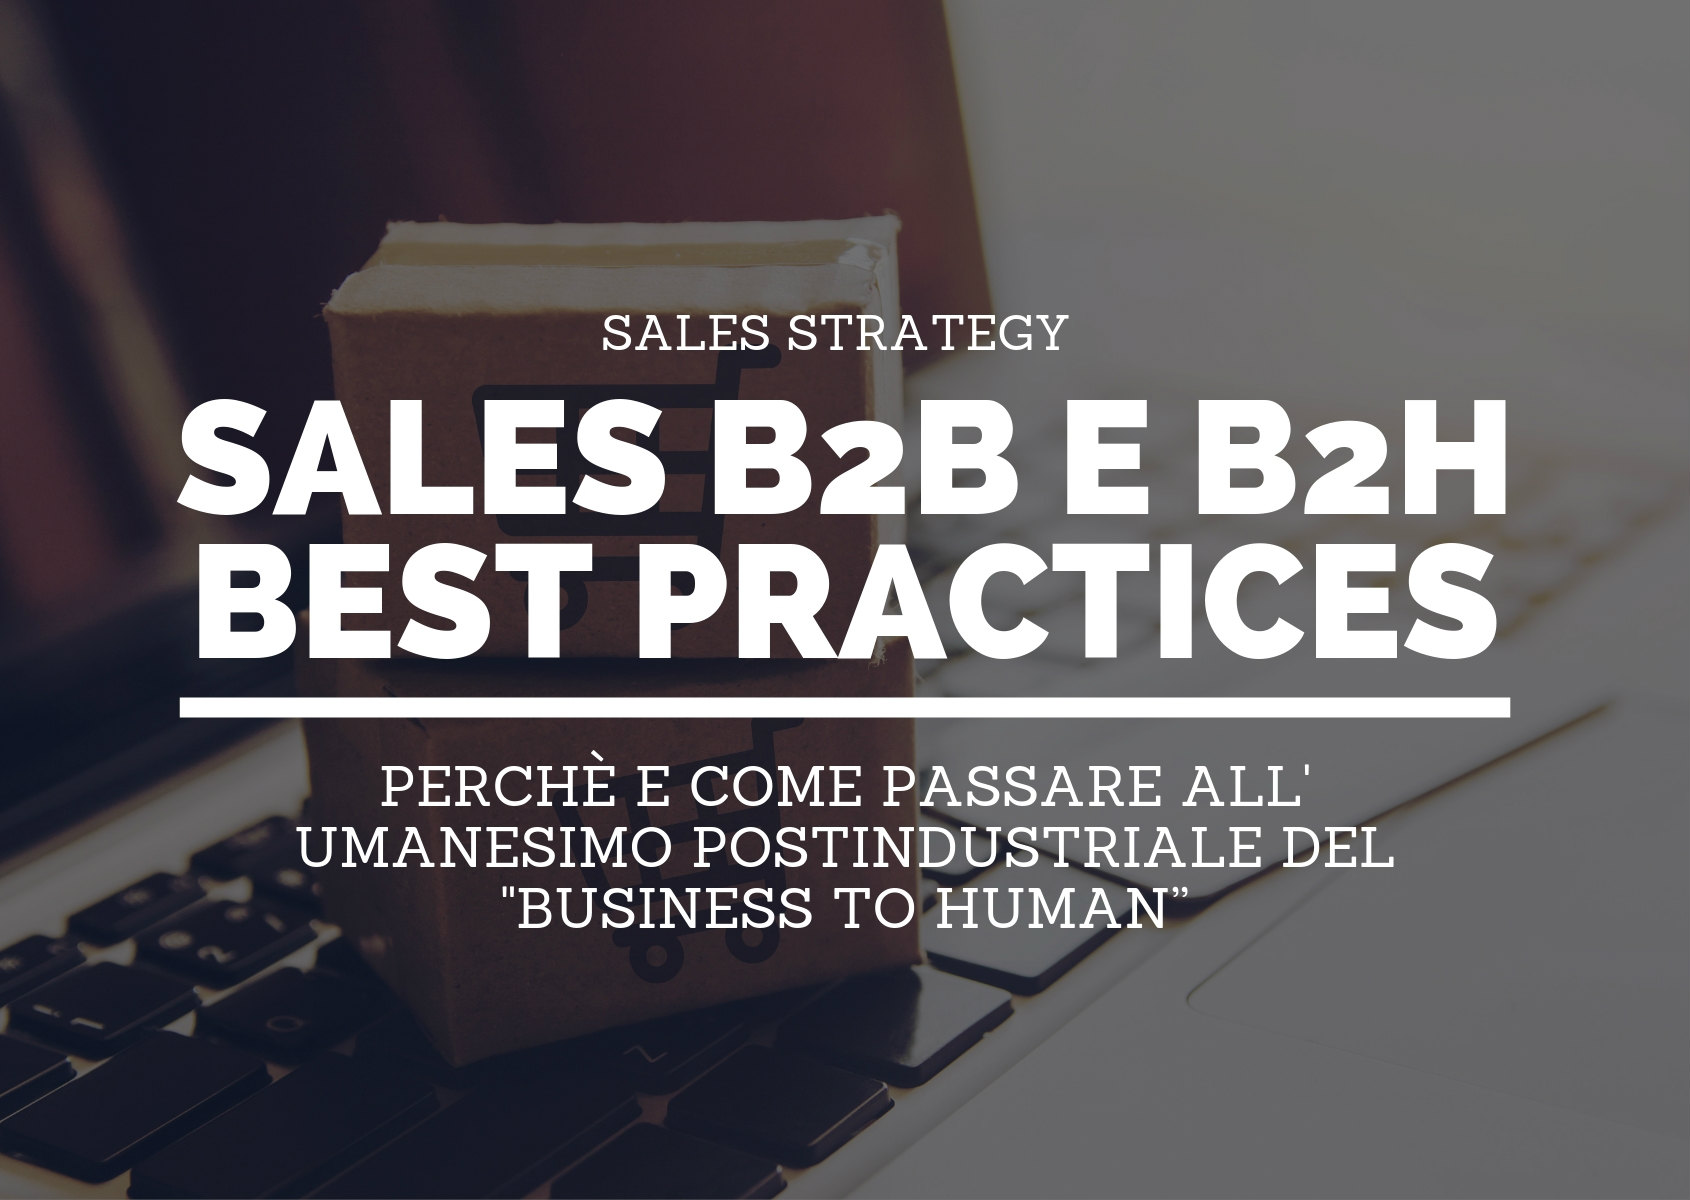 Sales B2B e B2H: tutte le best practices aggiornate